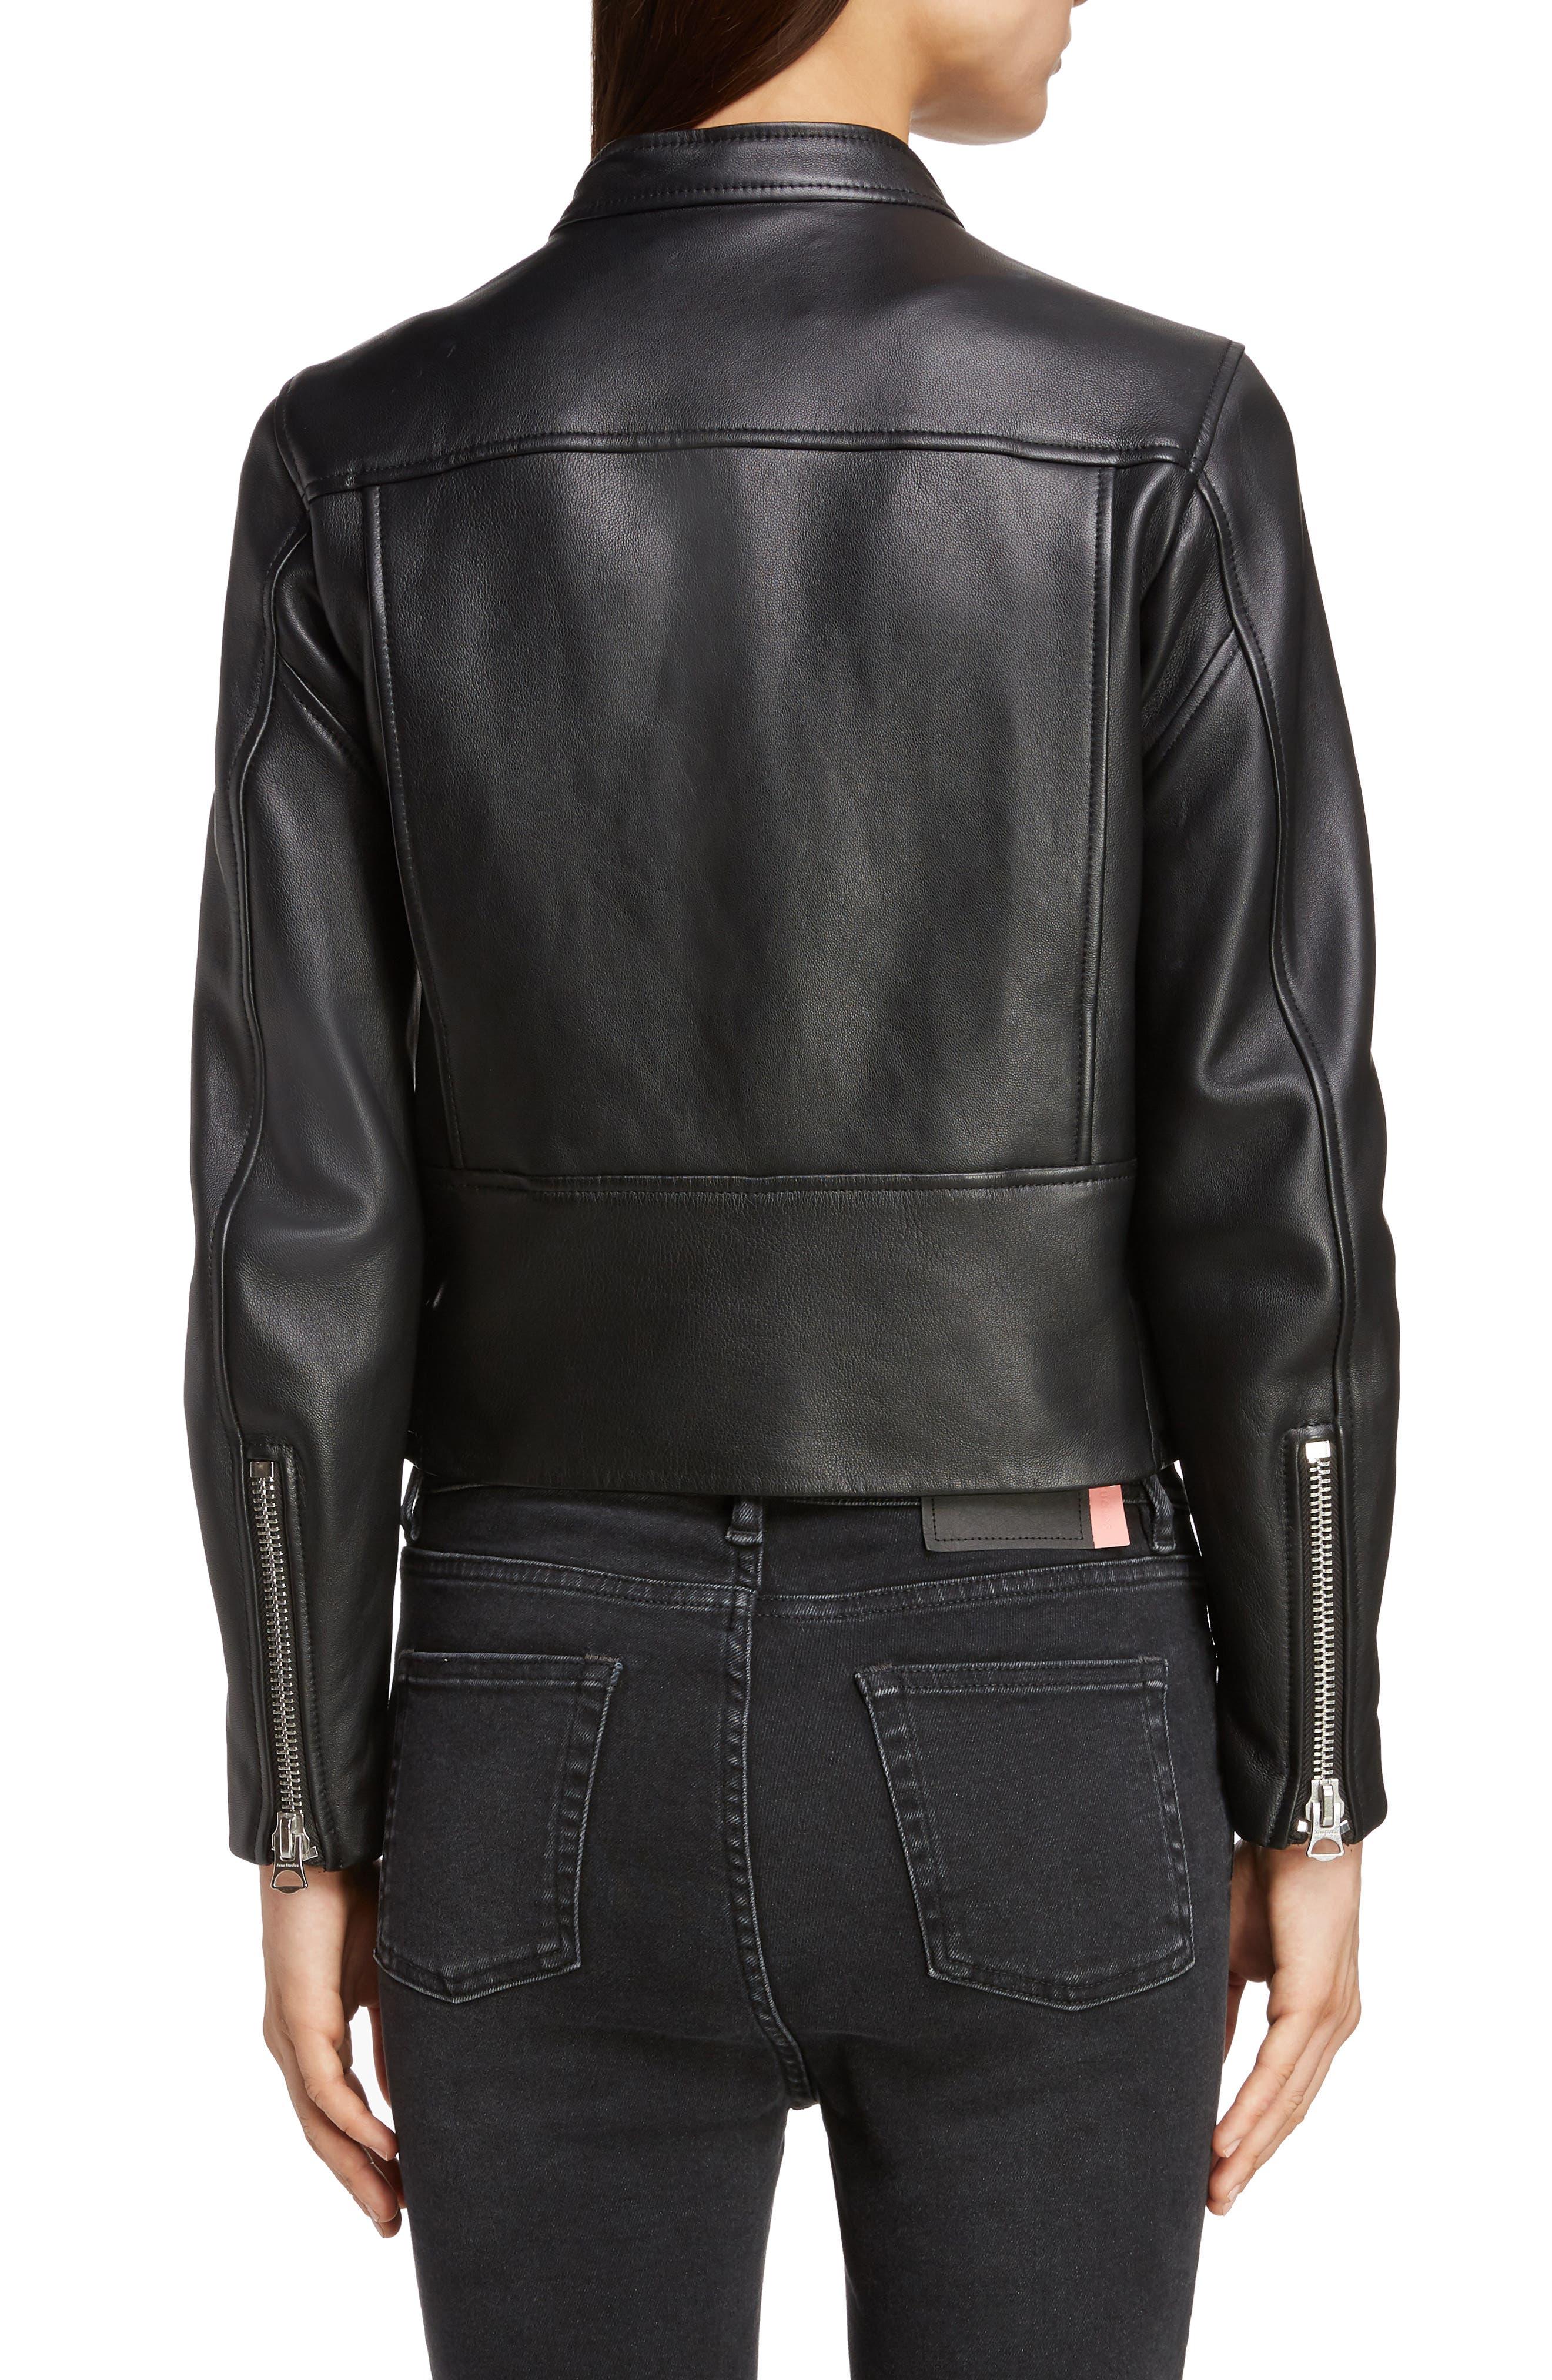 ACNE STUDIOS,                             Lewis Leather Moto Jacket,                             Alternate thumbnail 2, color,                             BLACK